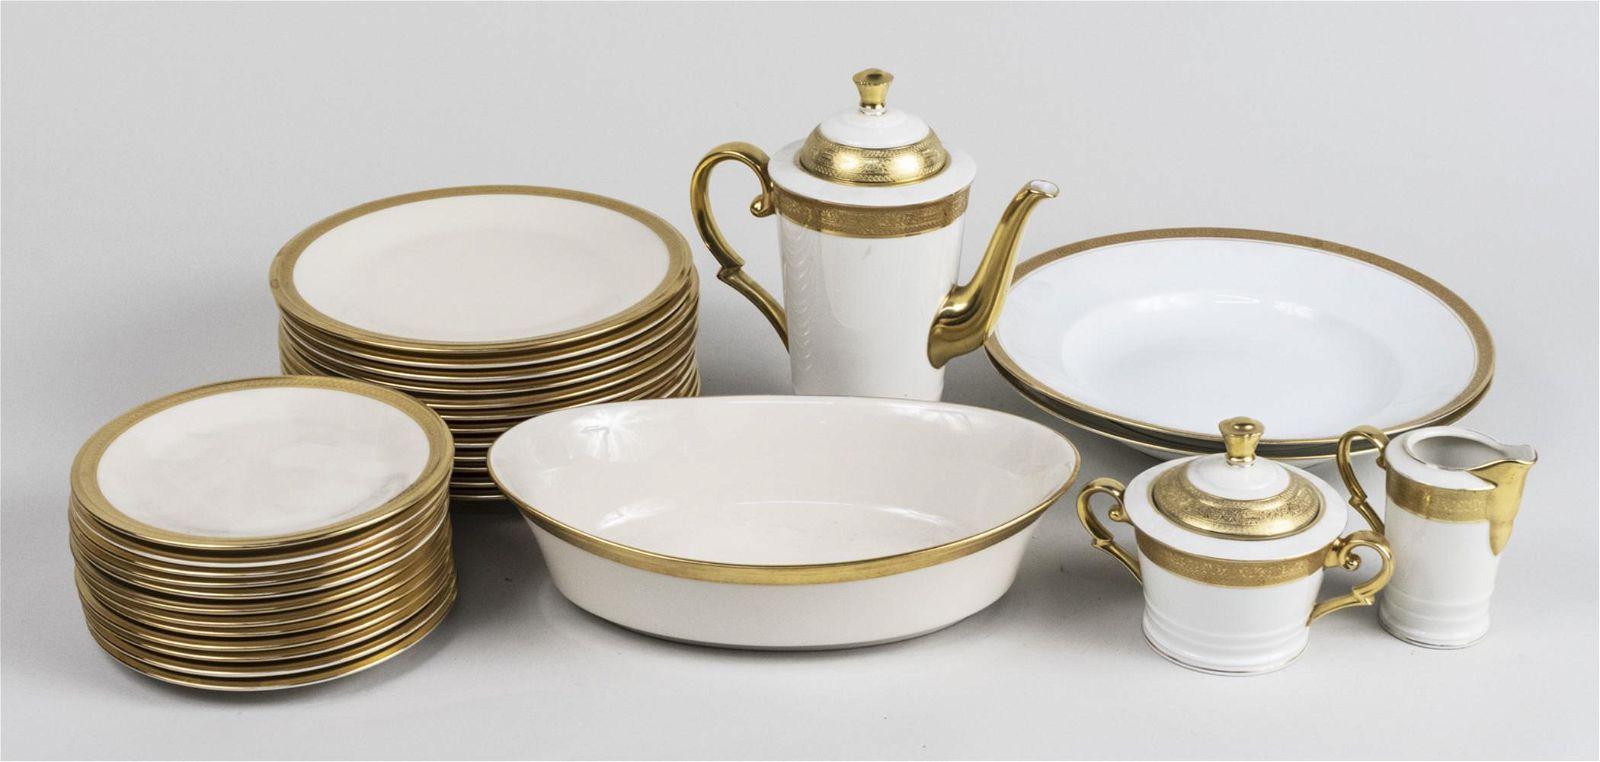 Assembled Gilt Decorated Partial Dinner Set